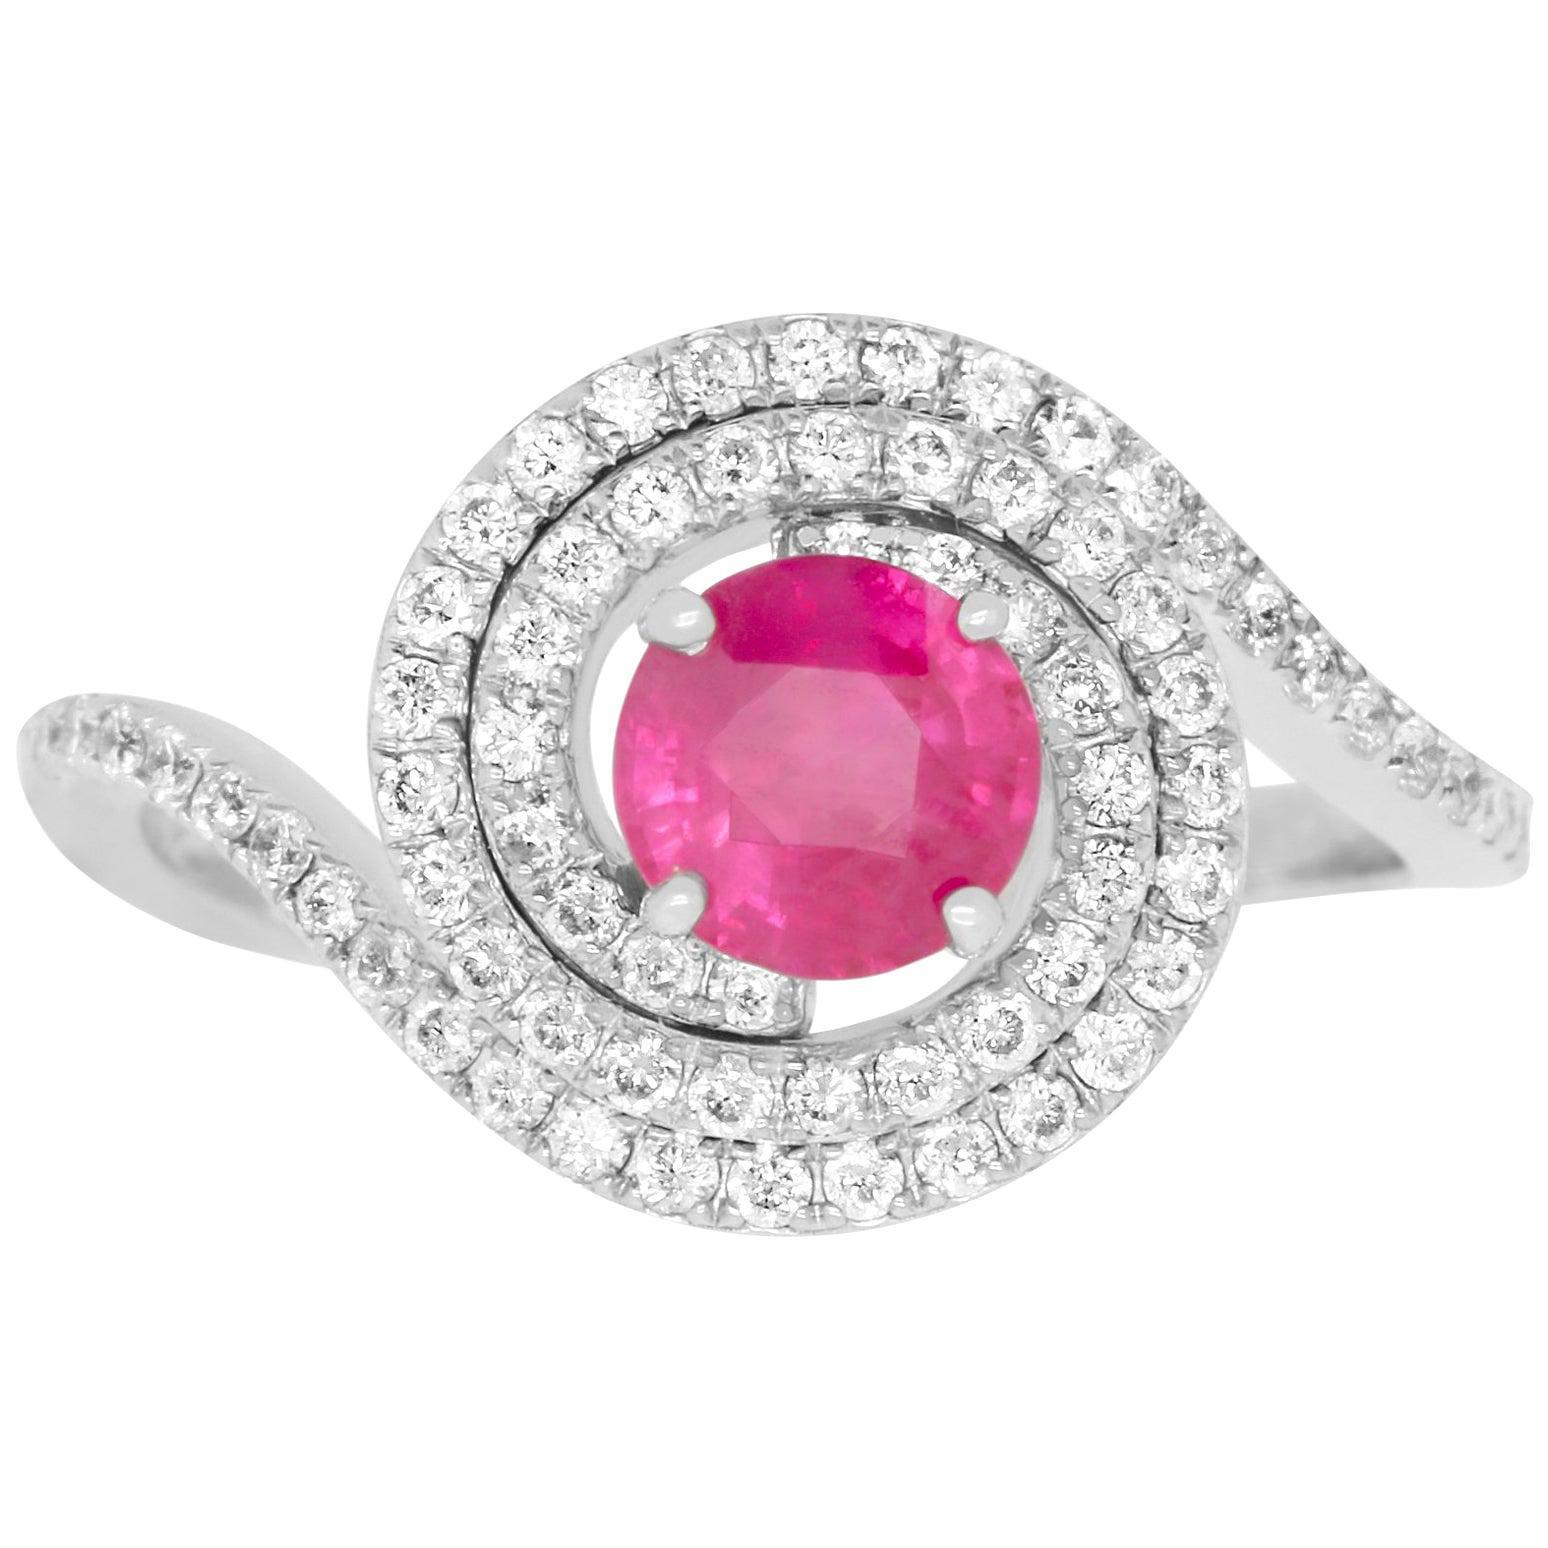 Round Pink Natural Ruby White Diamond Double Halo Ring 14K White Gold